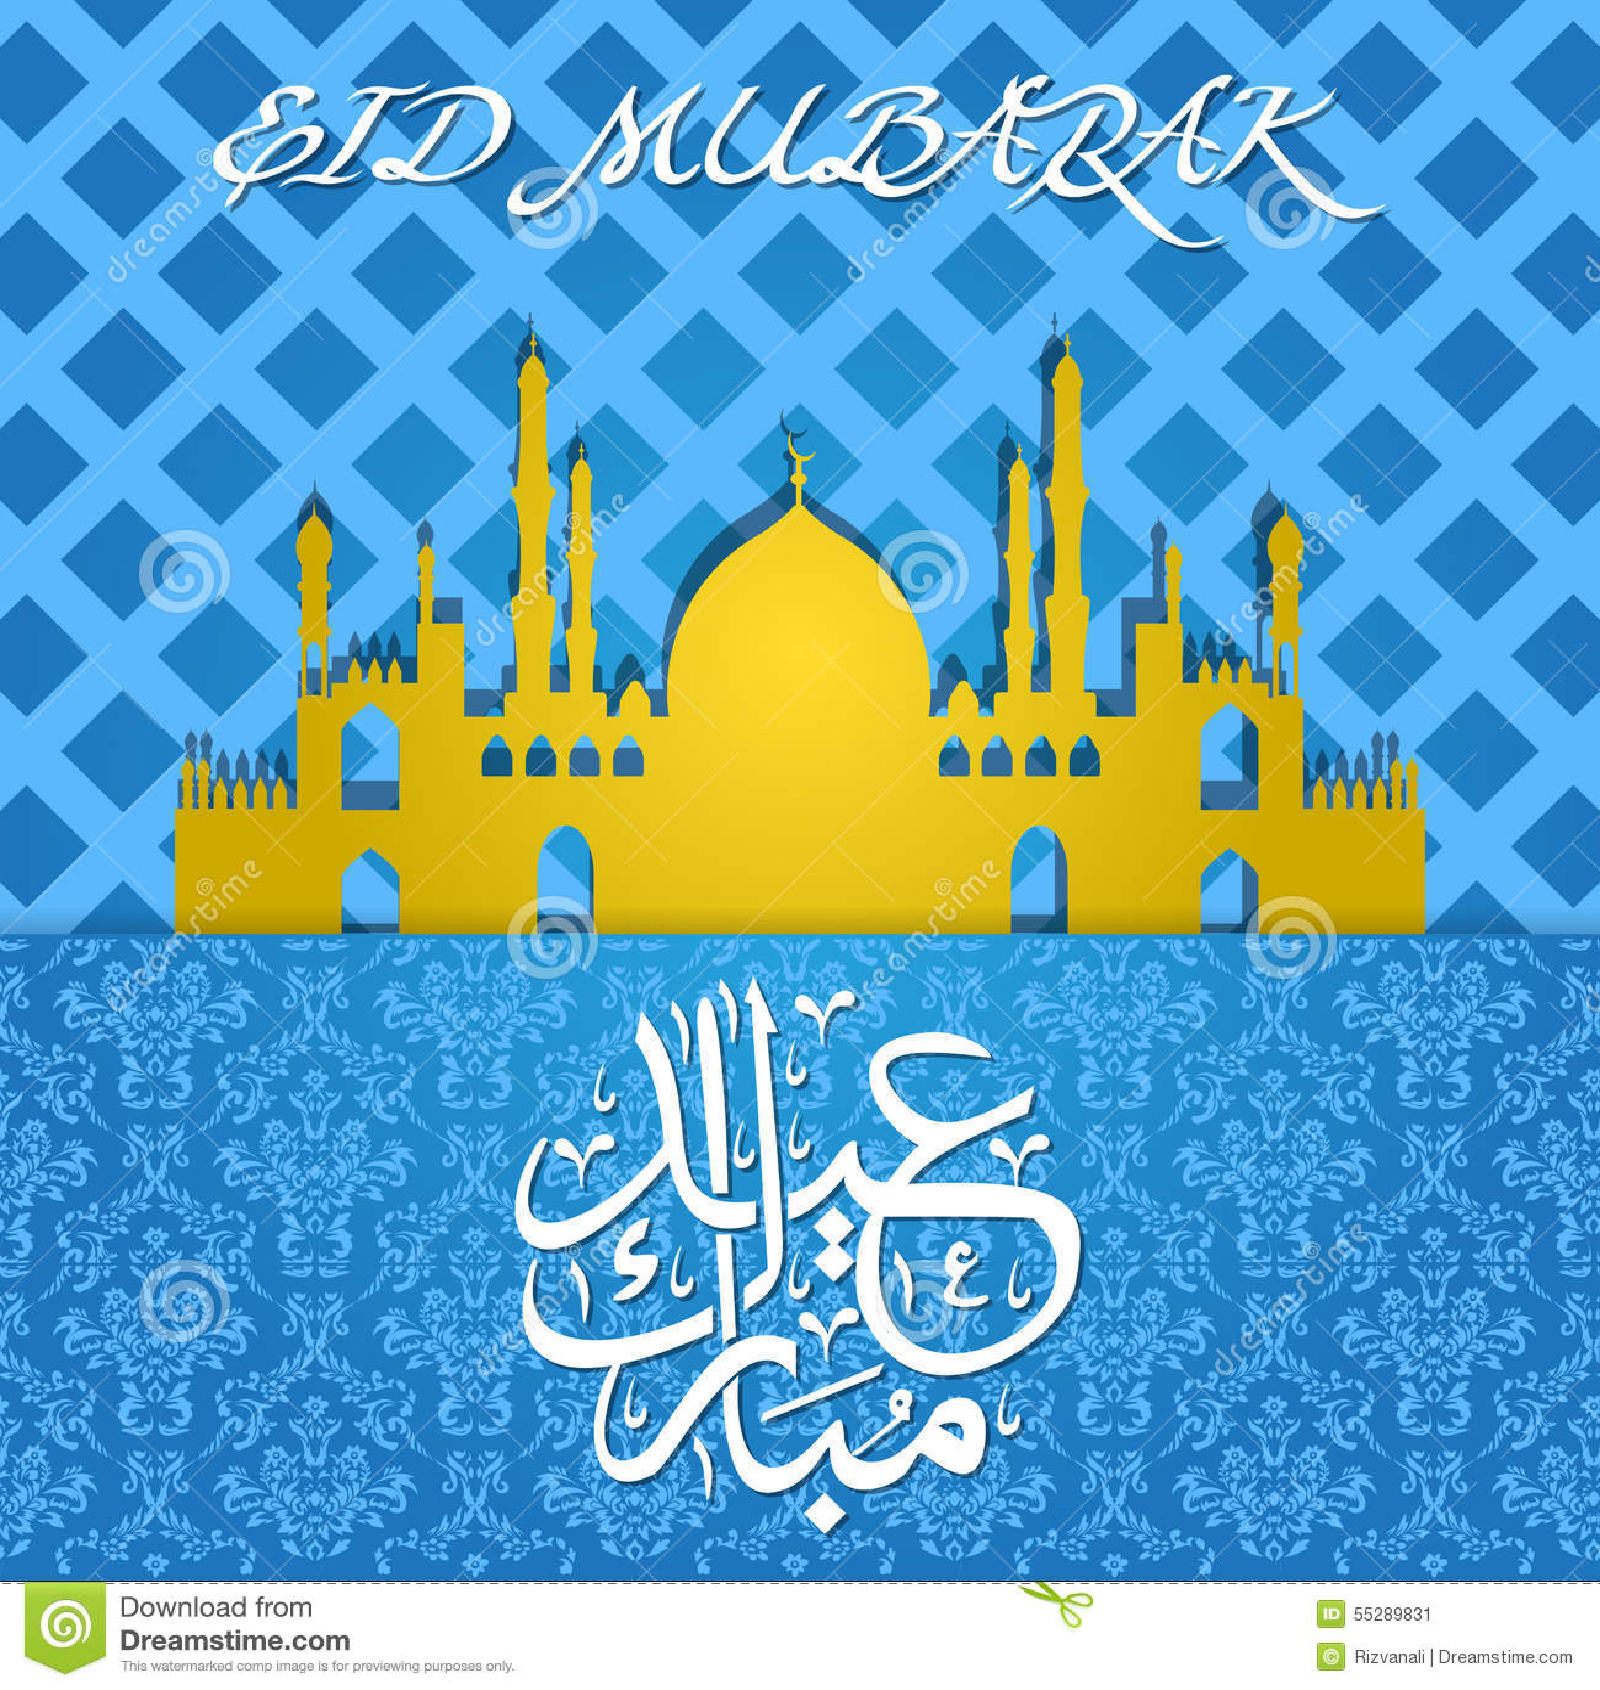 Eid Ul Fitr Greeting Card Stock Vector Illustration Of Calligraphy